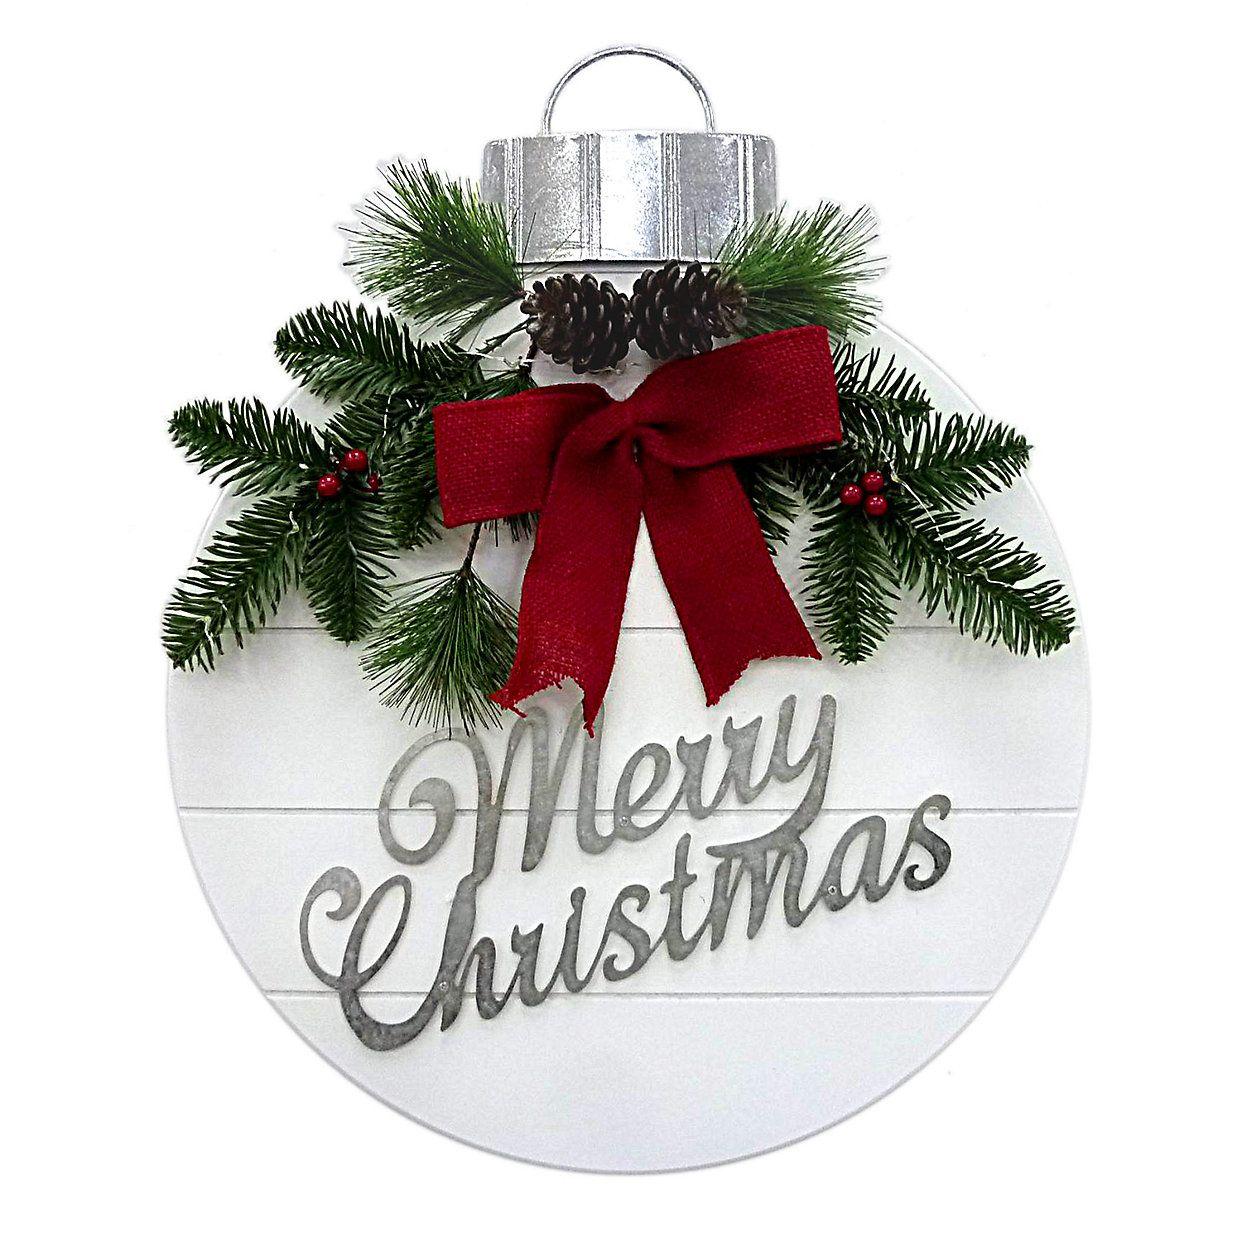 St. Nicholas Square Light-Up Christmas Ornament Wall Decoration -   20 christmas decorations ideas